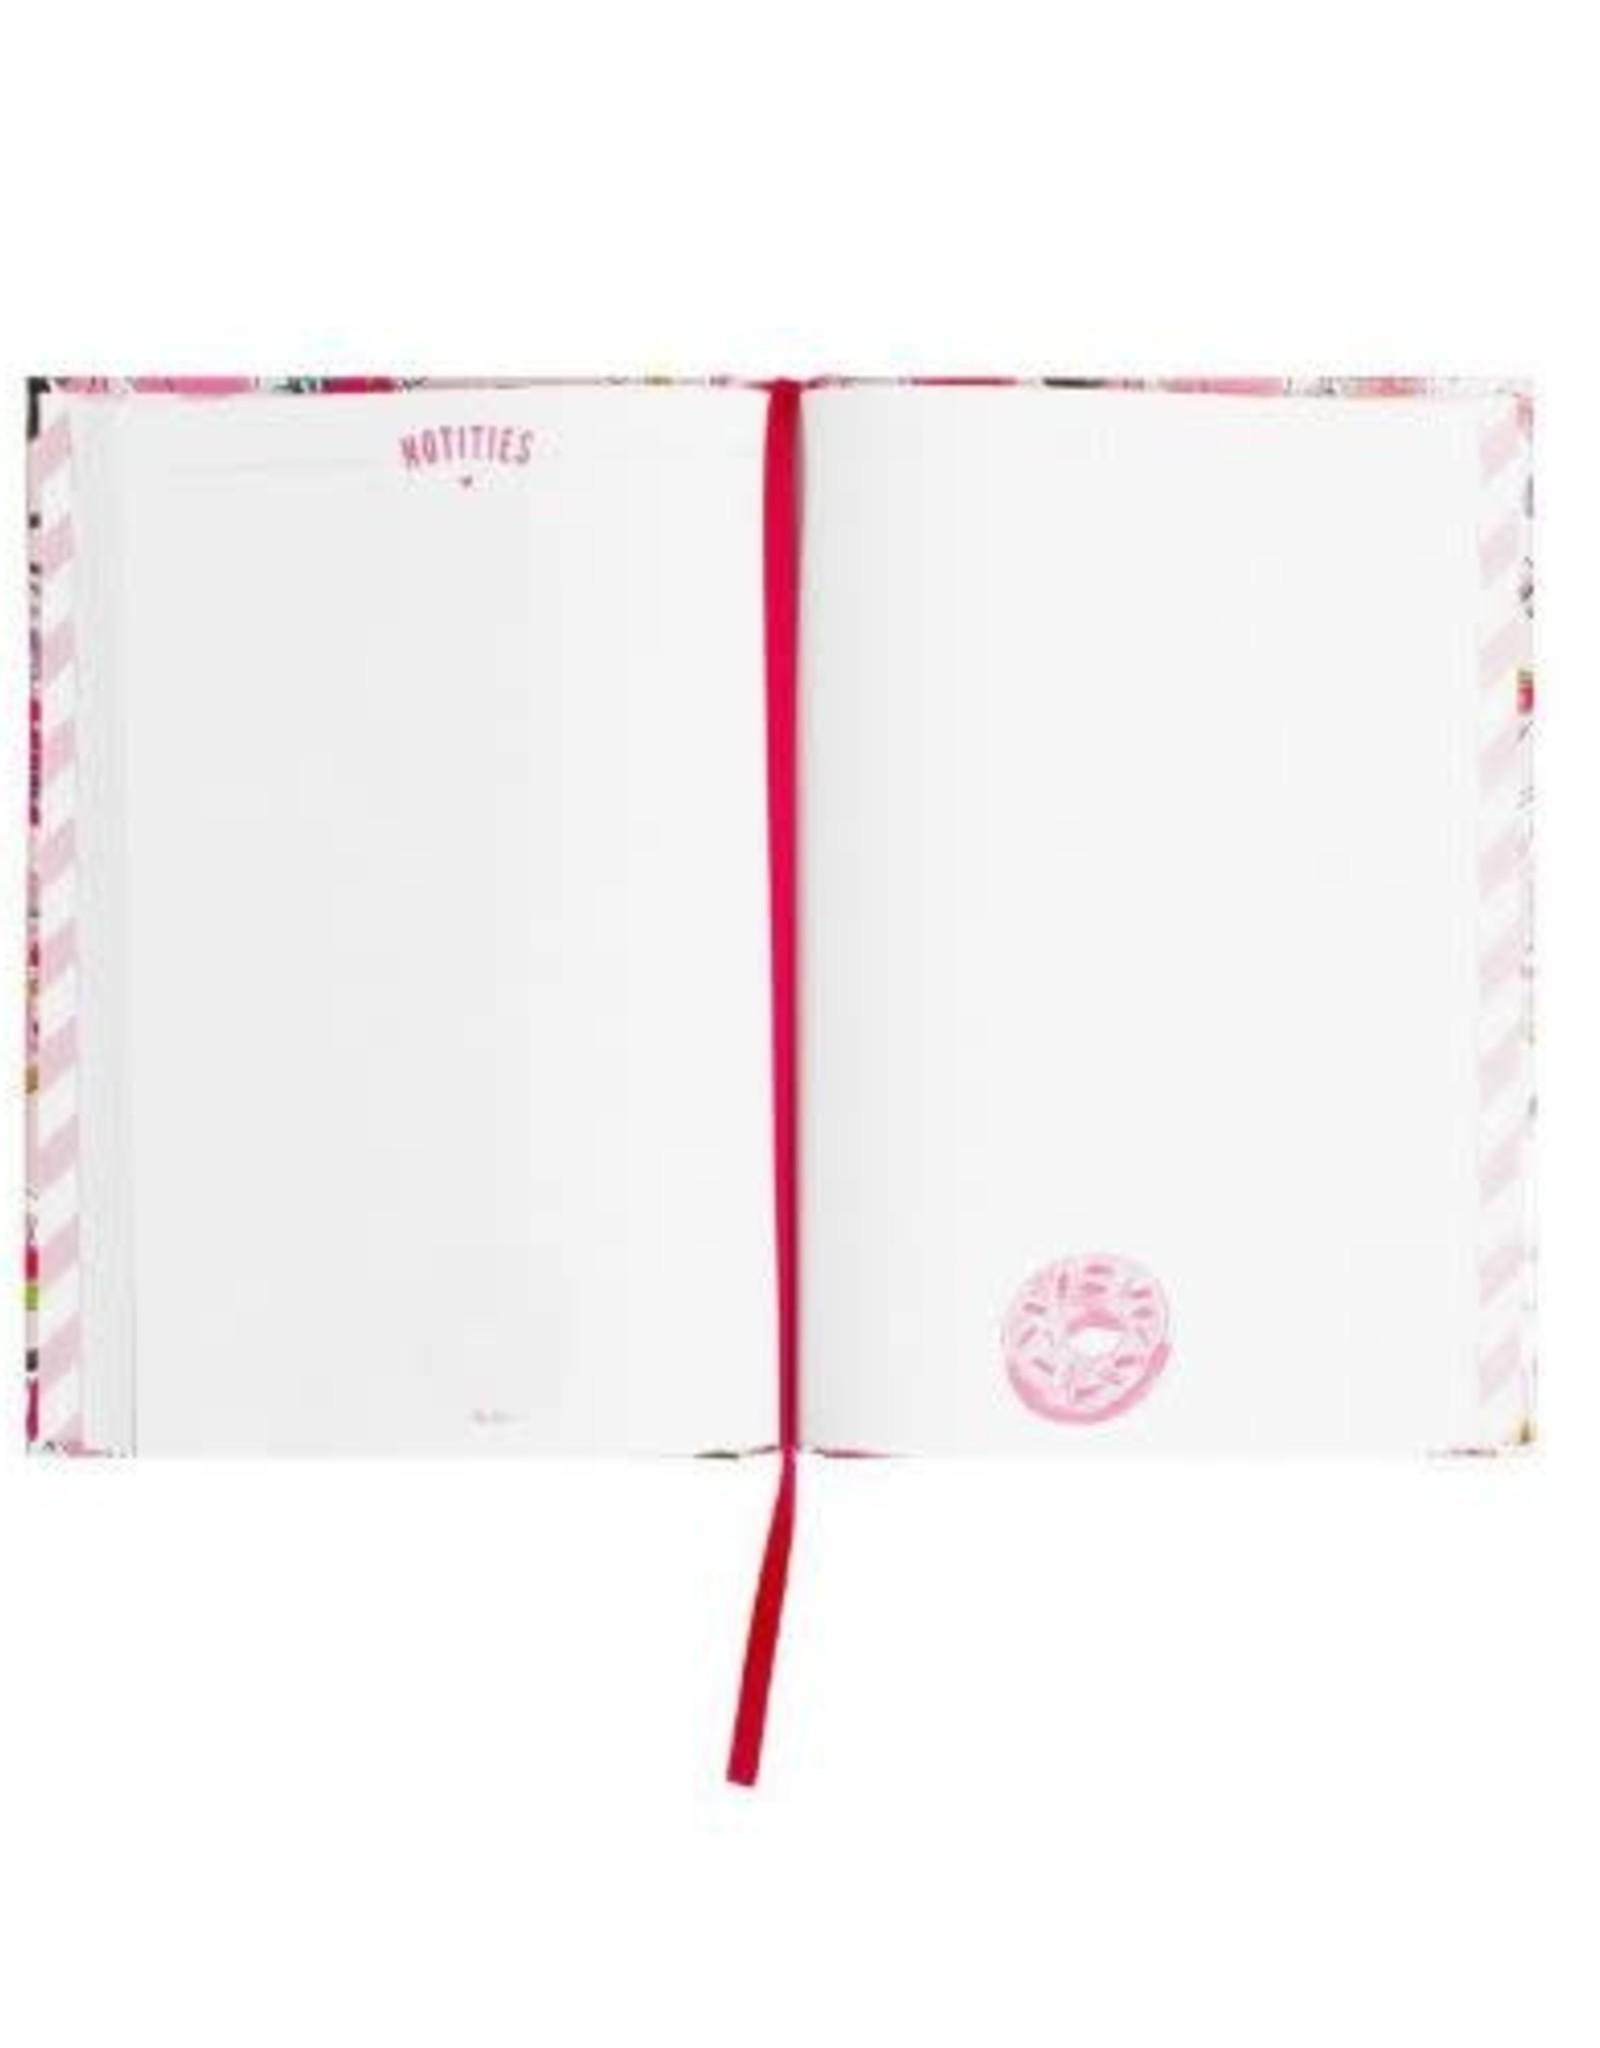 Blond Amsterdam Notitieboek A5 Pink Stuff - Blond Amsterdam